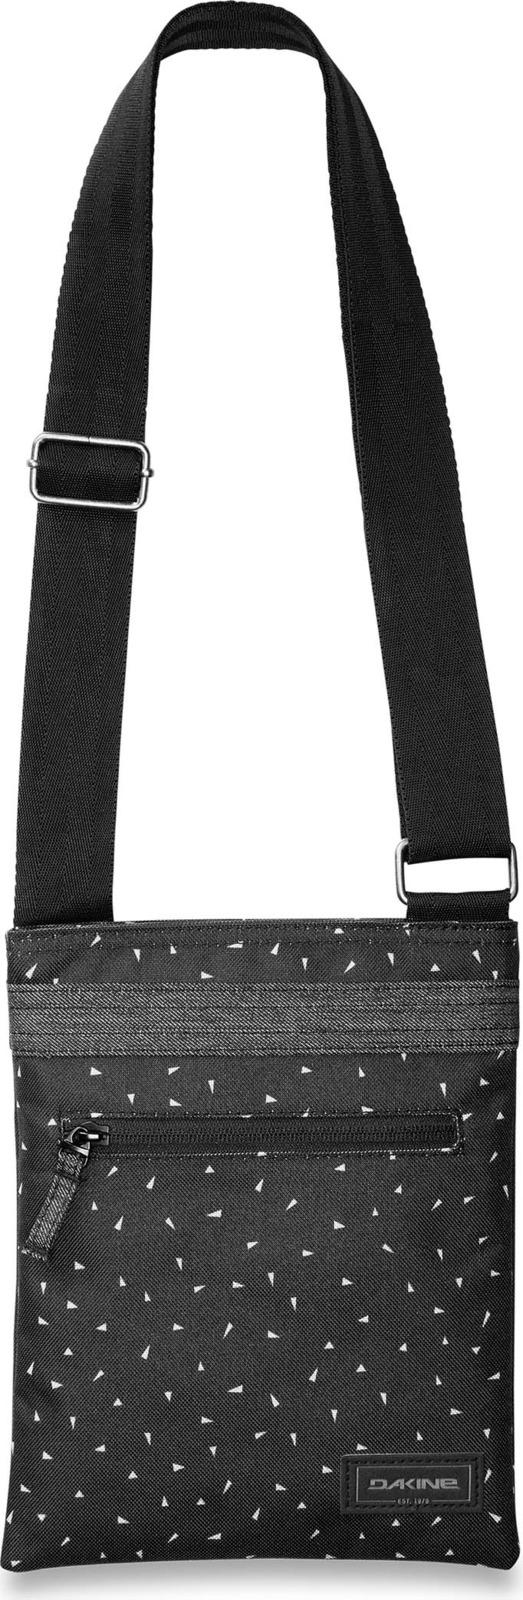 Сумка на плечо женская Dakine Jive Kiki, цвет: черный, сумка женская dakine stashable tote teal shadow